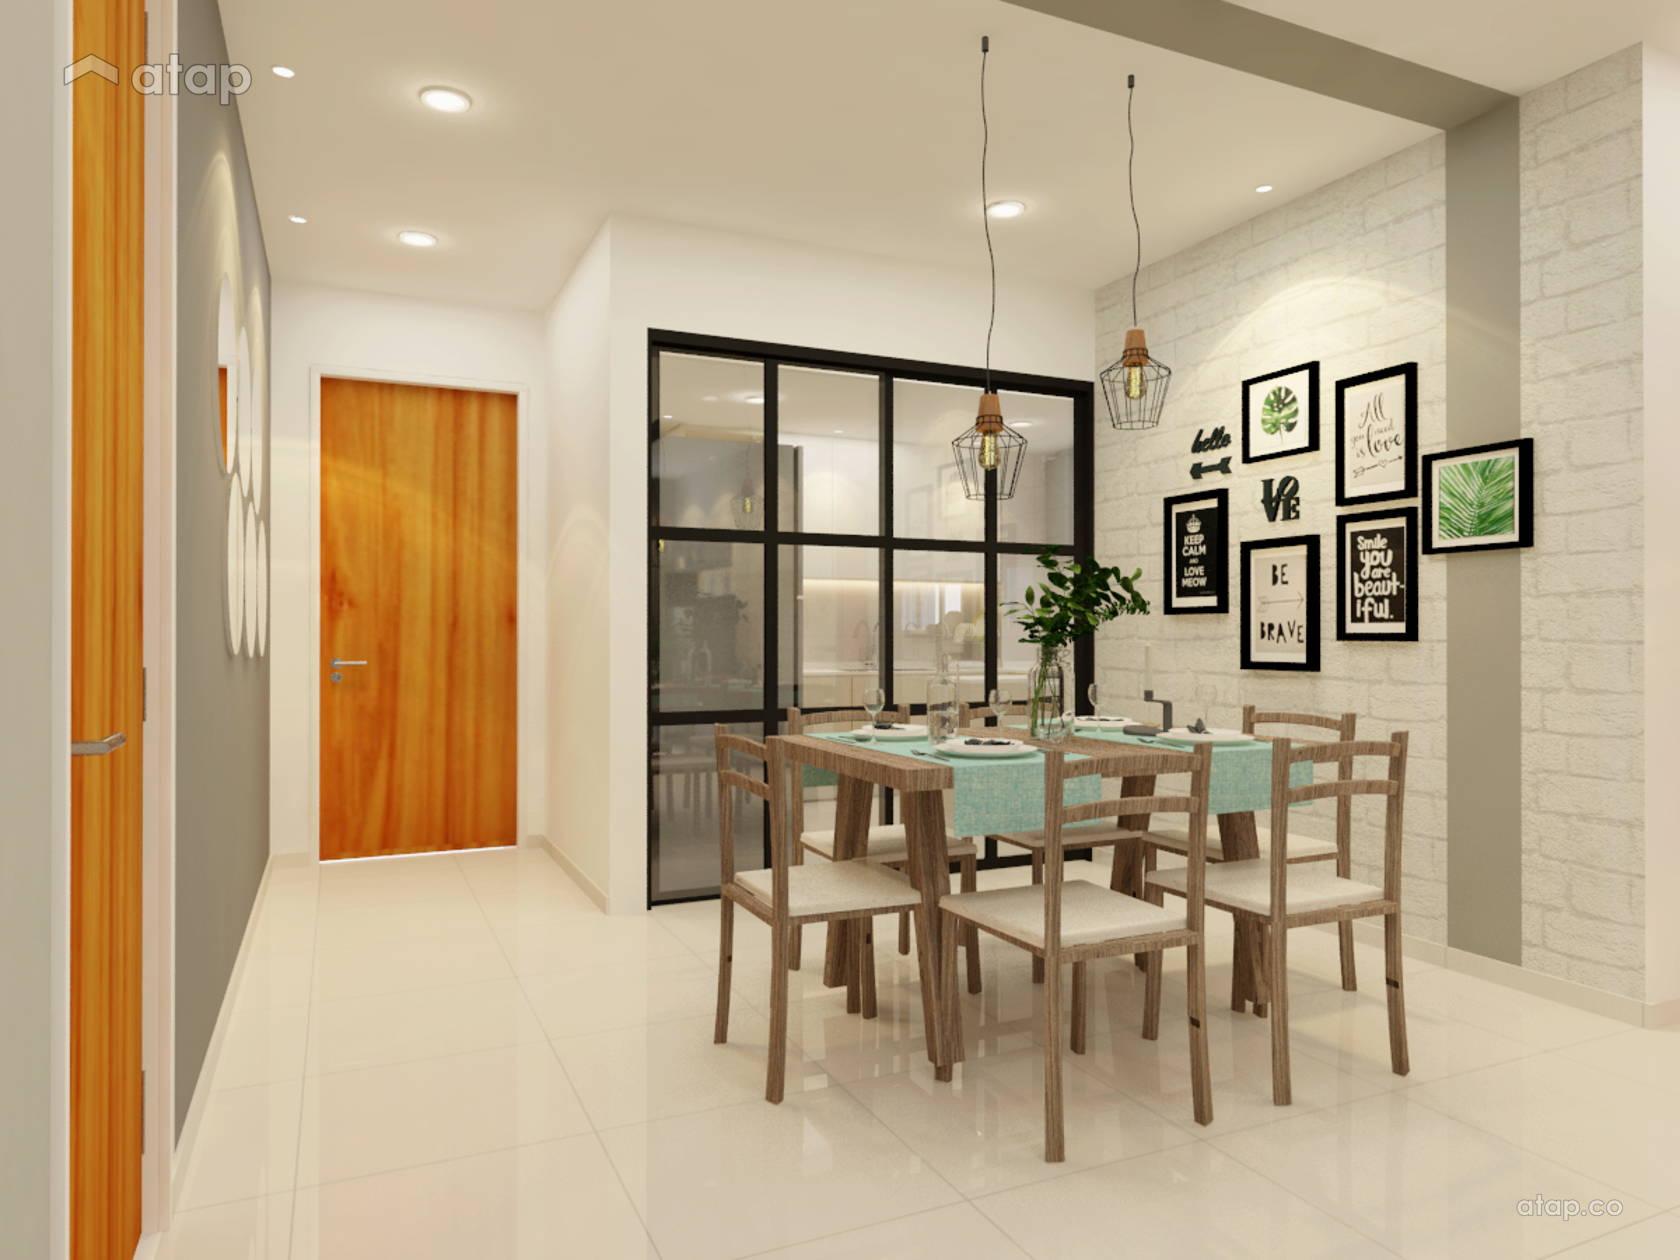 Asian Modern Dining Room Kitchen Condominium Design Ideas Photos Malaysia Atap Co